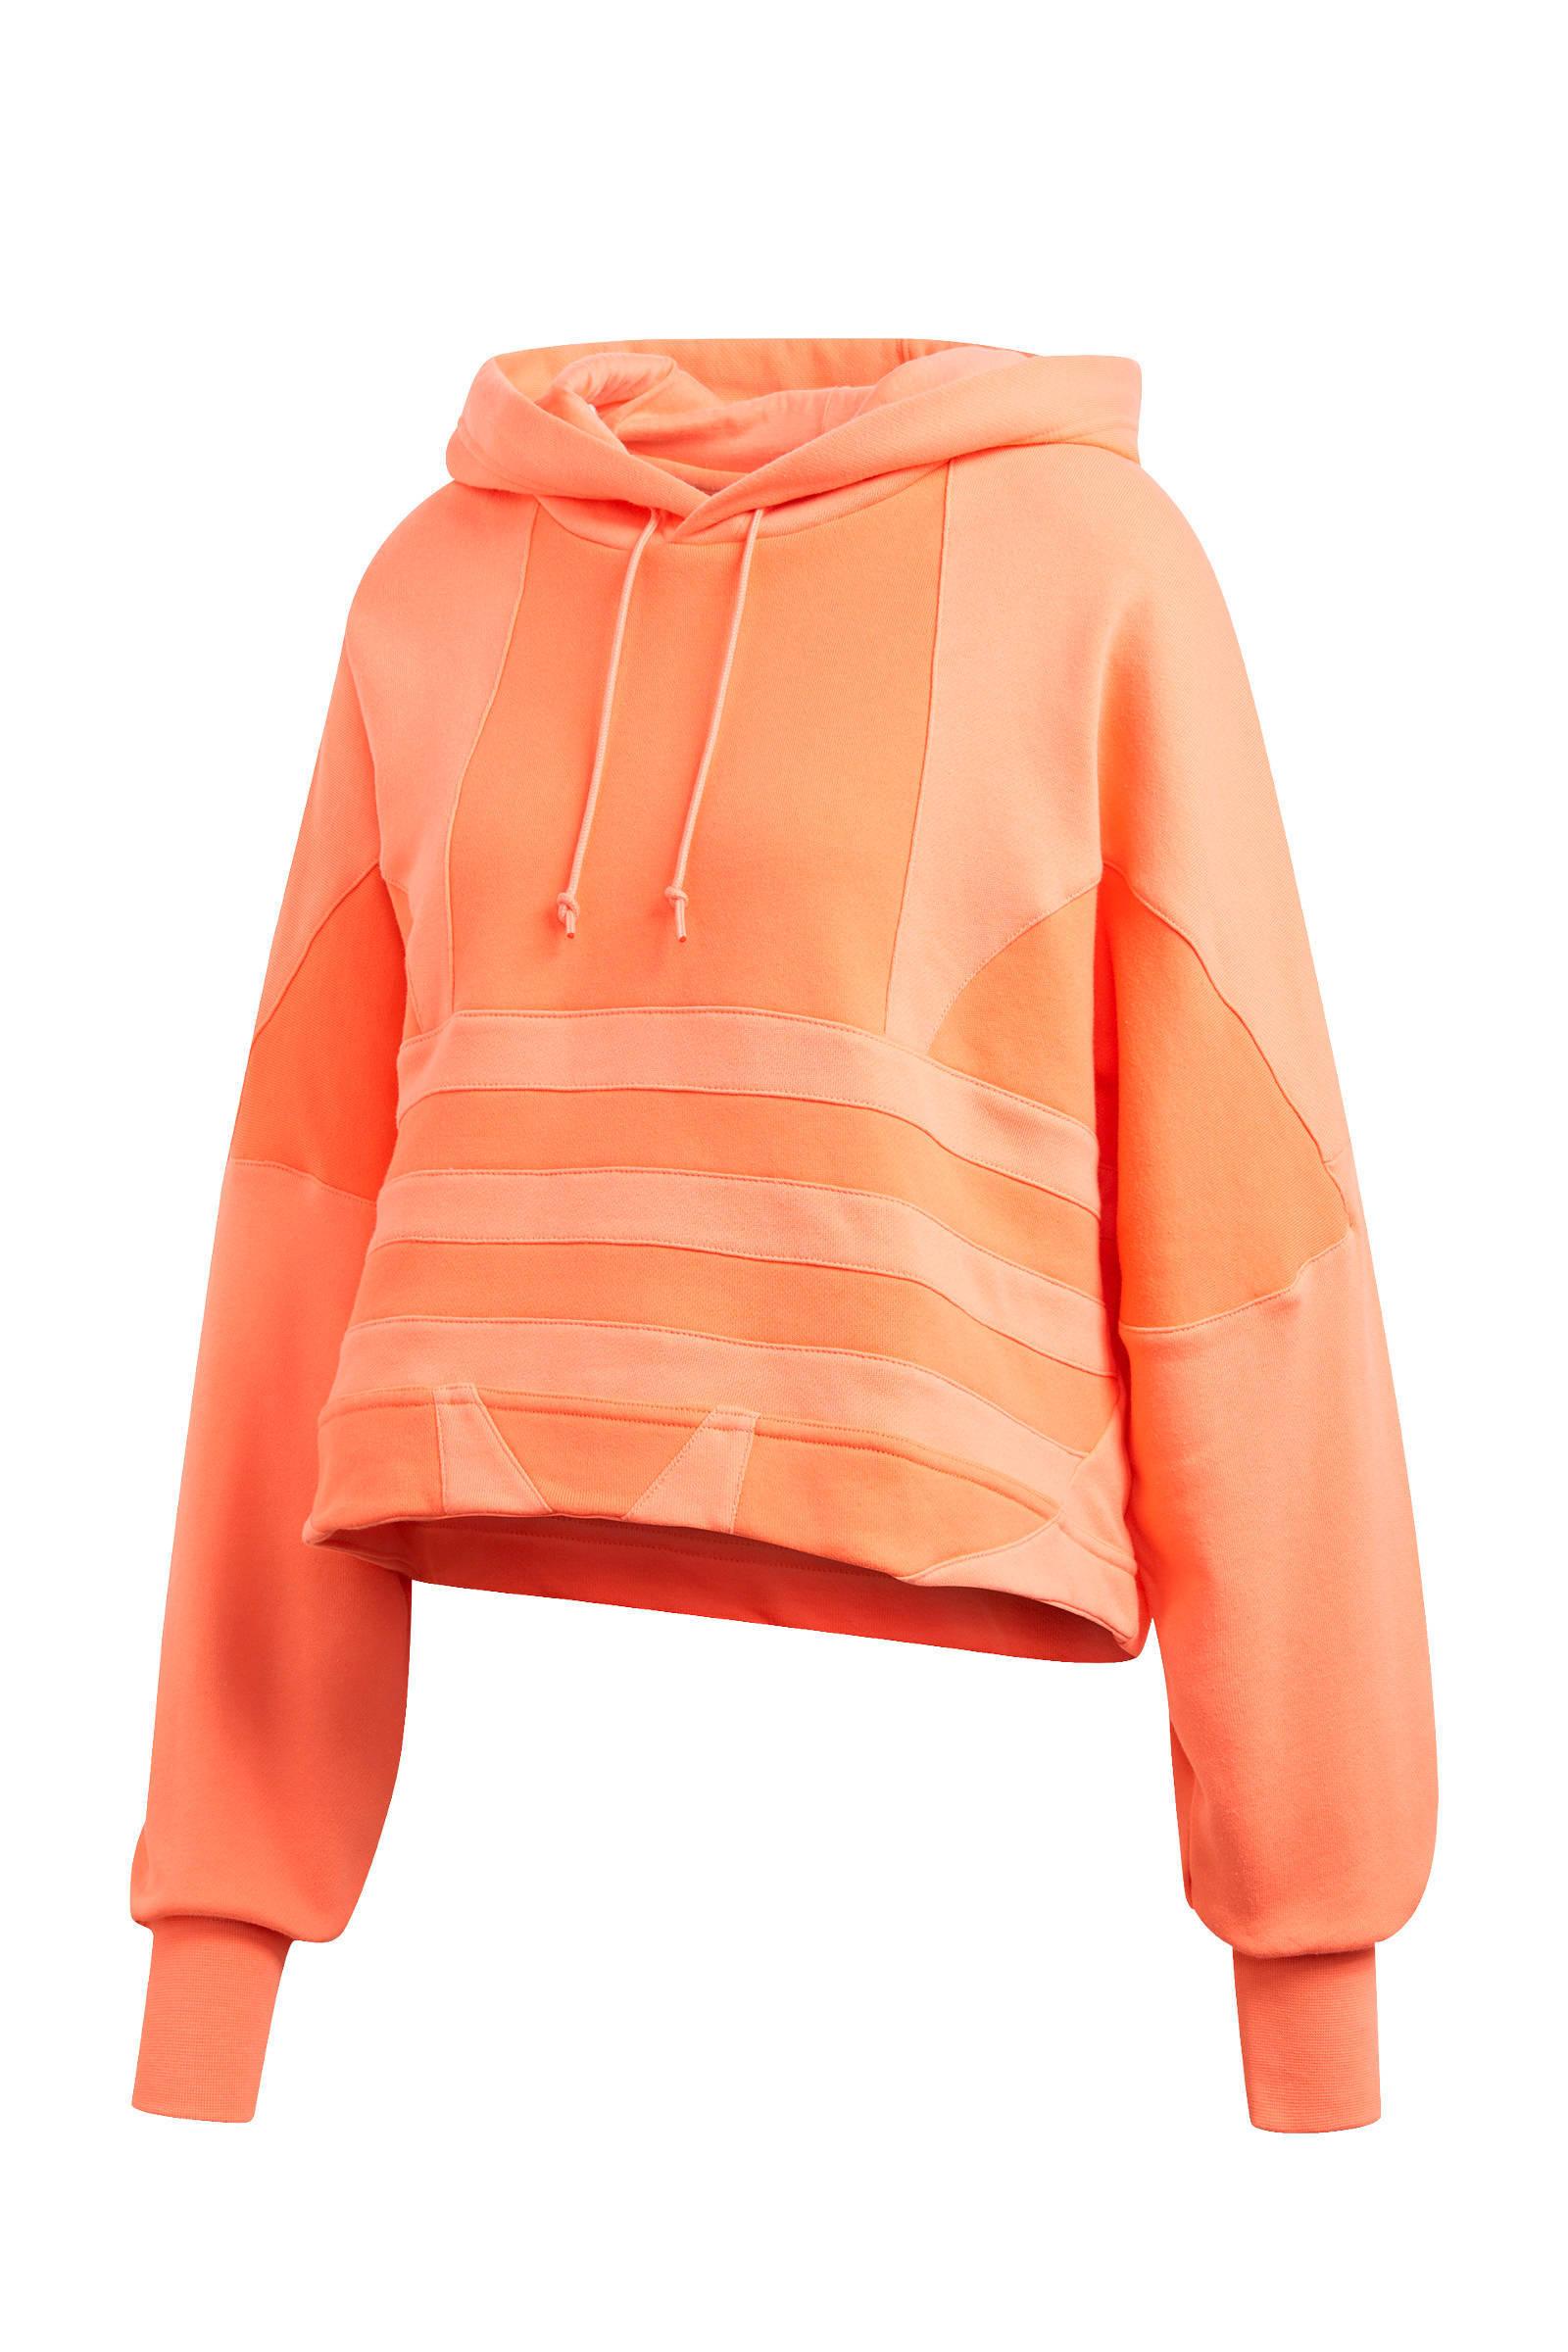 adidas Originals cropped hoodie oranje | wehkamp